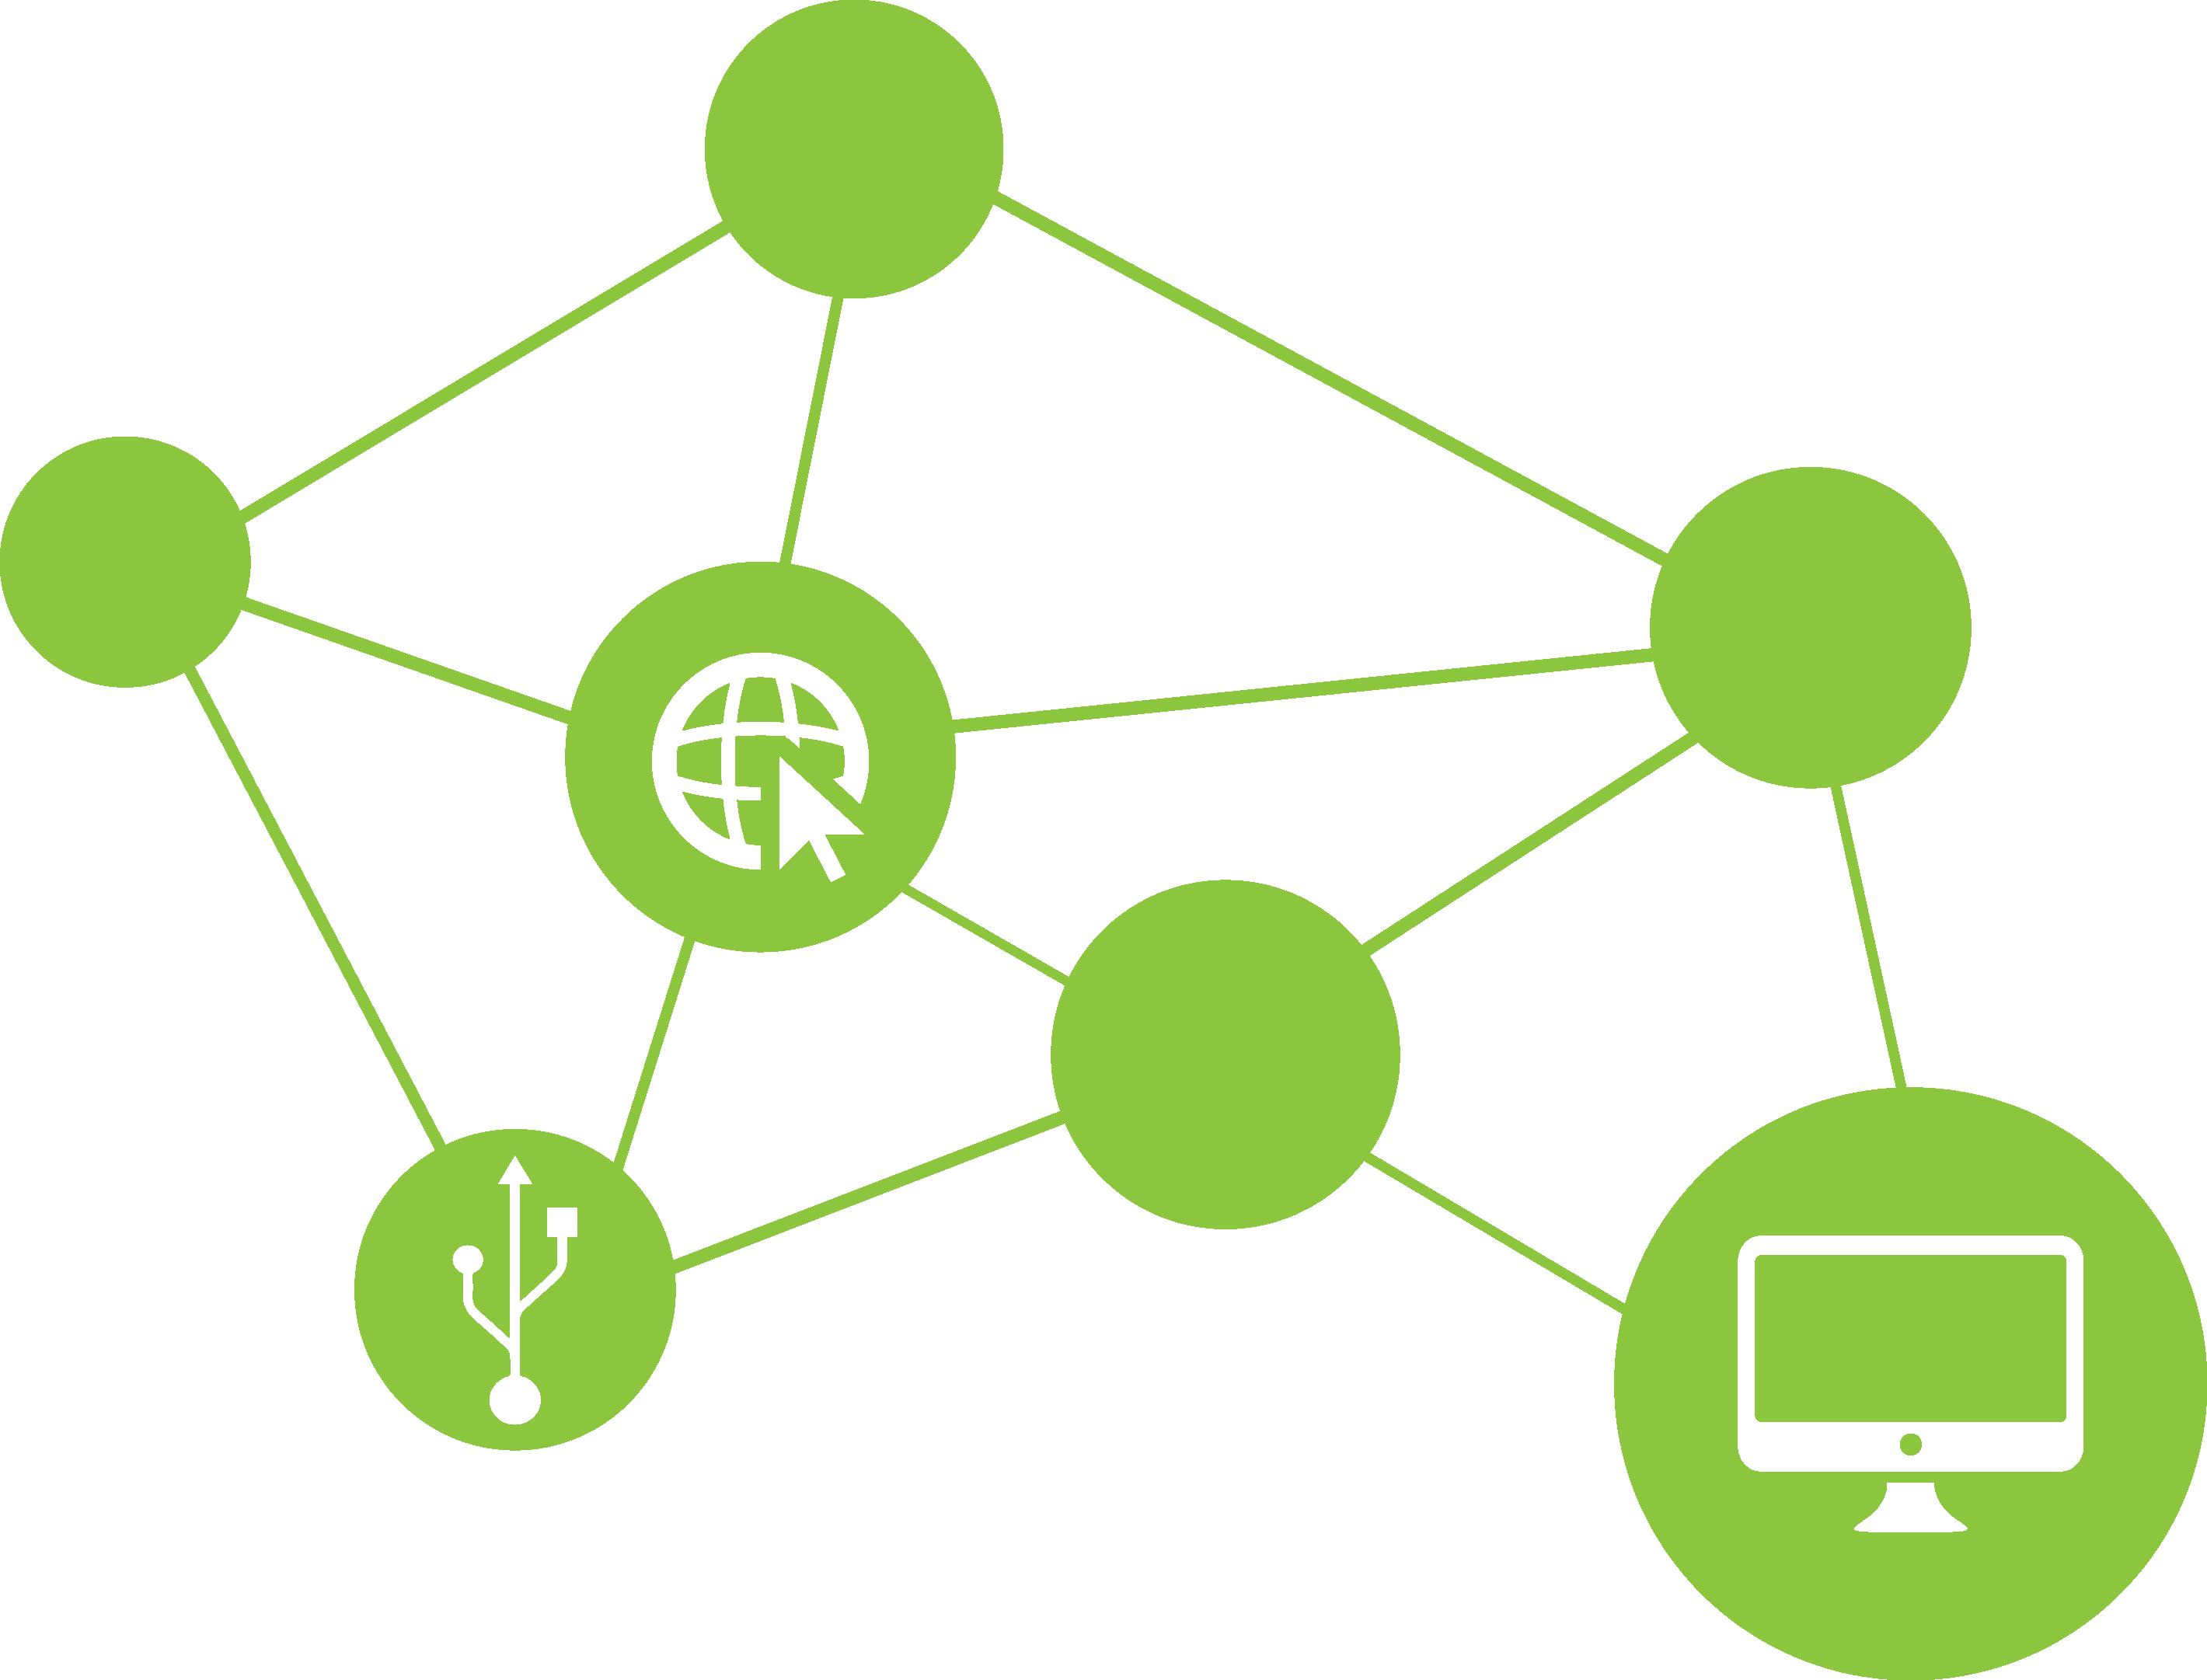 Money network clipart clipart transparent stock Networking Clipart Icon | Web Icons PNG clipart transparent stock